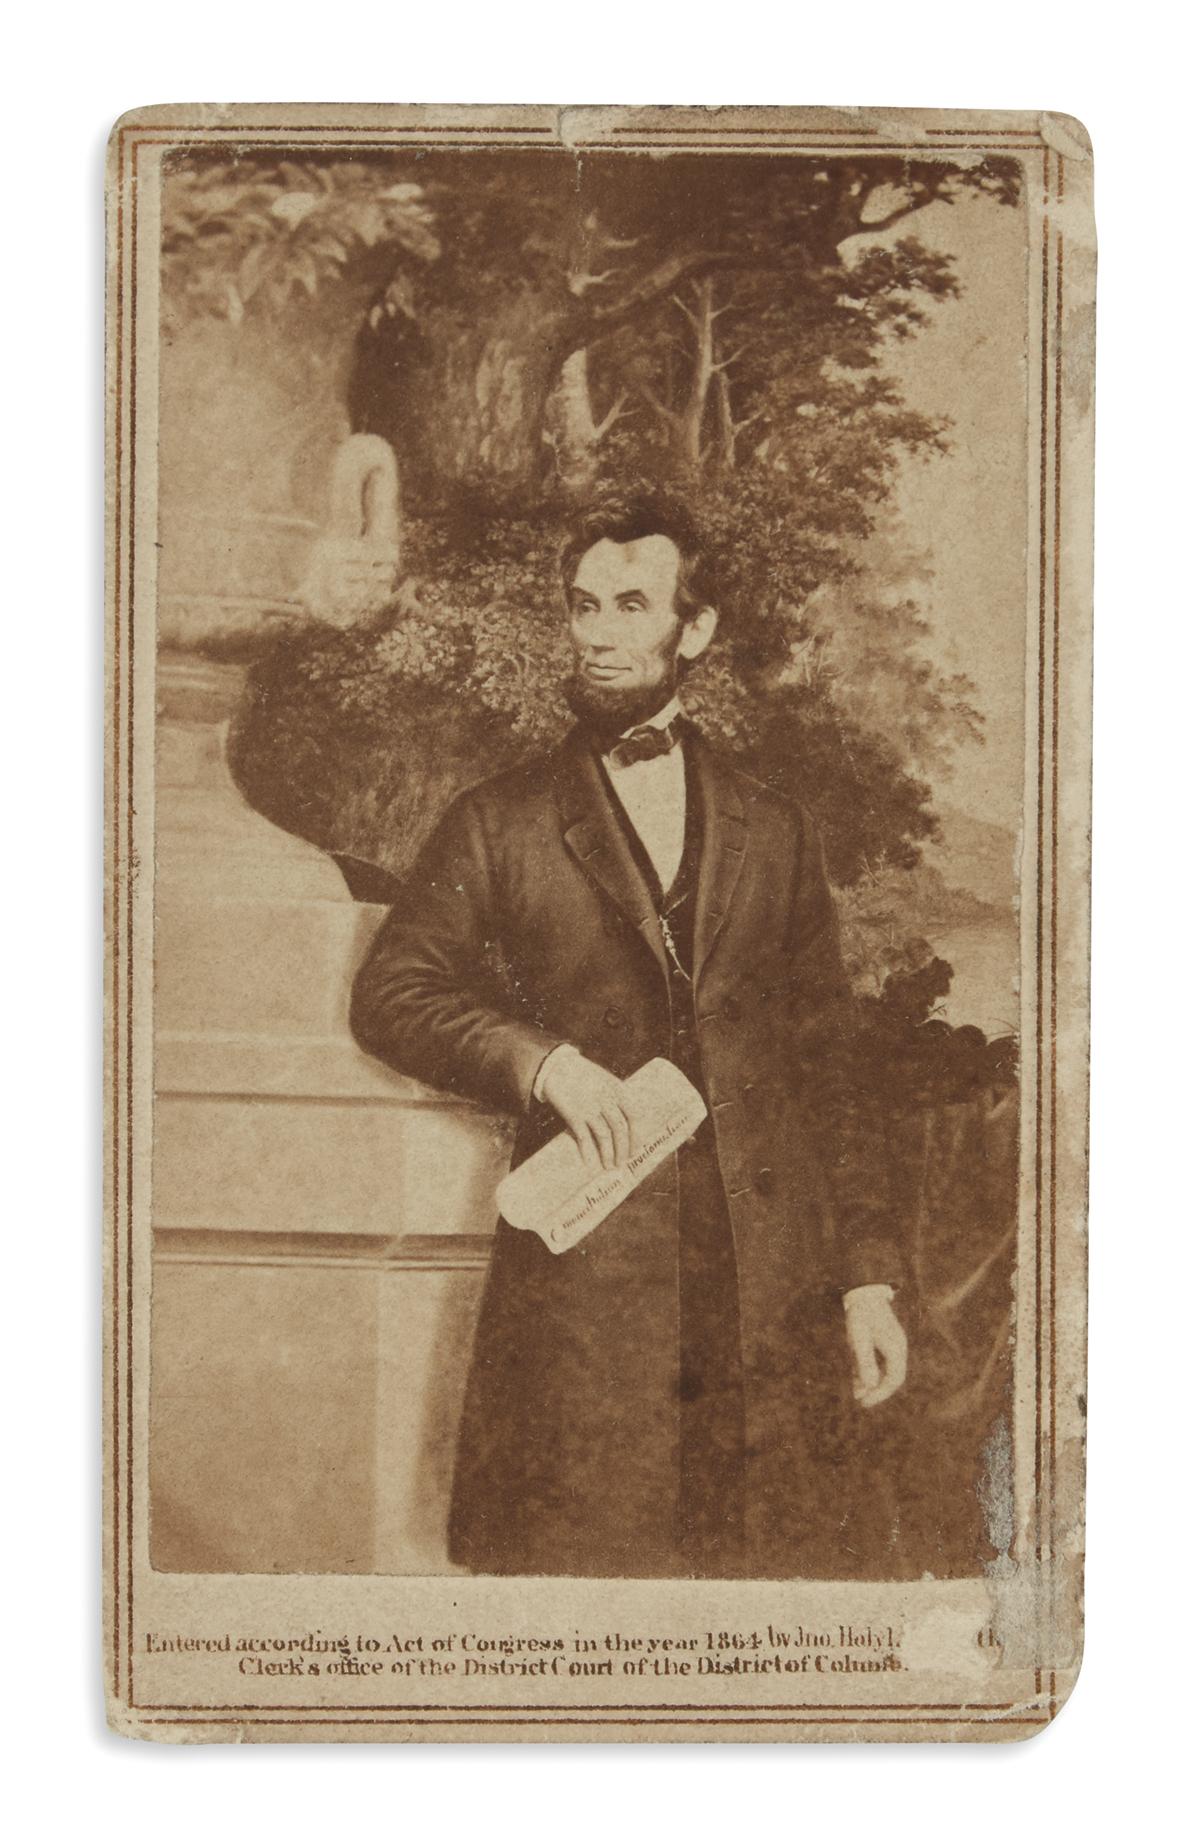 (PHOTOGRAPHY)-A-carte-de-visite-of-Lincoln-with-the-Emancipa